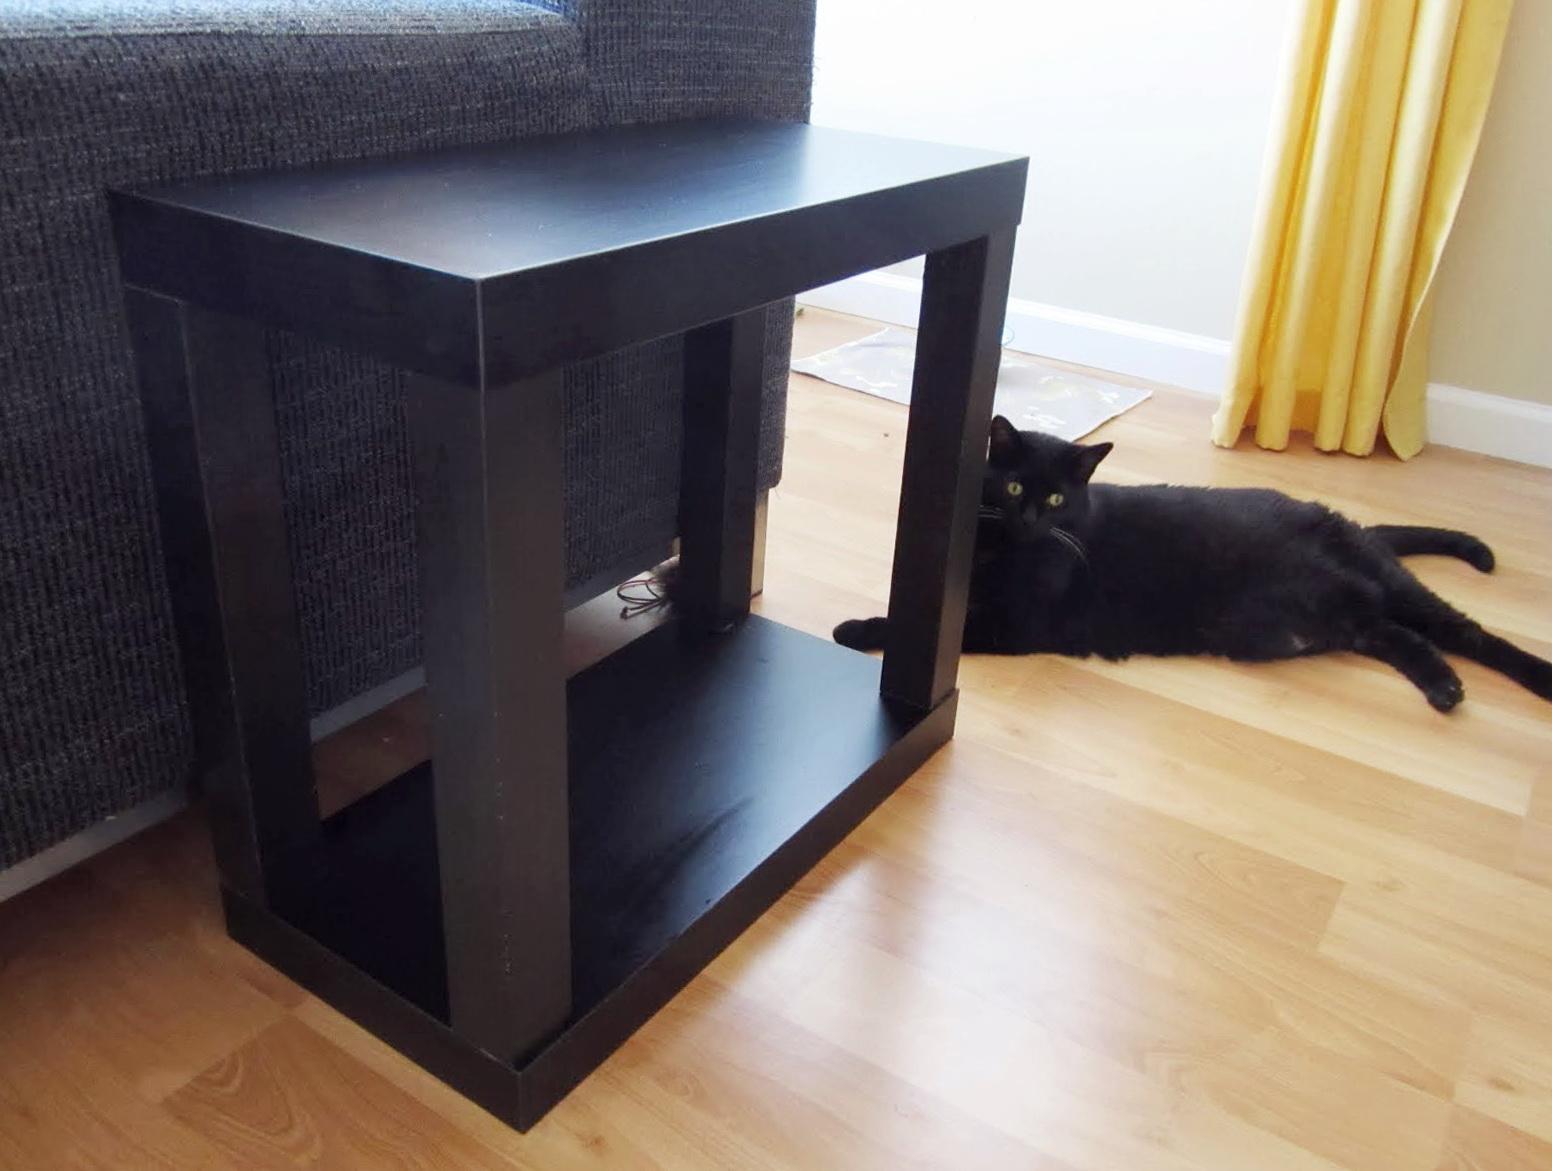 Ikea Lack Side Table Ideas